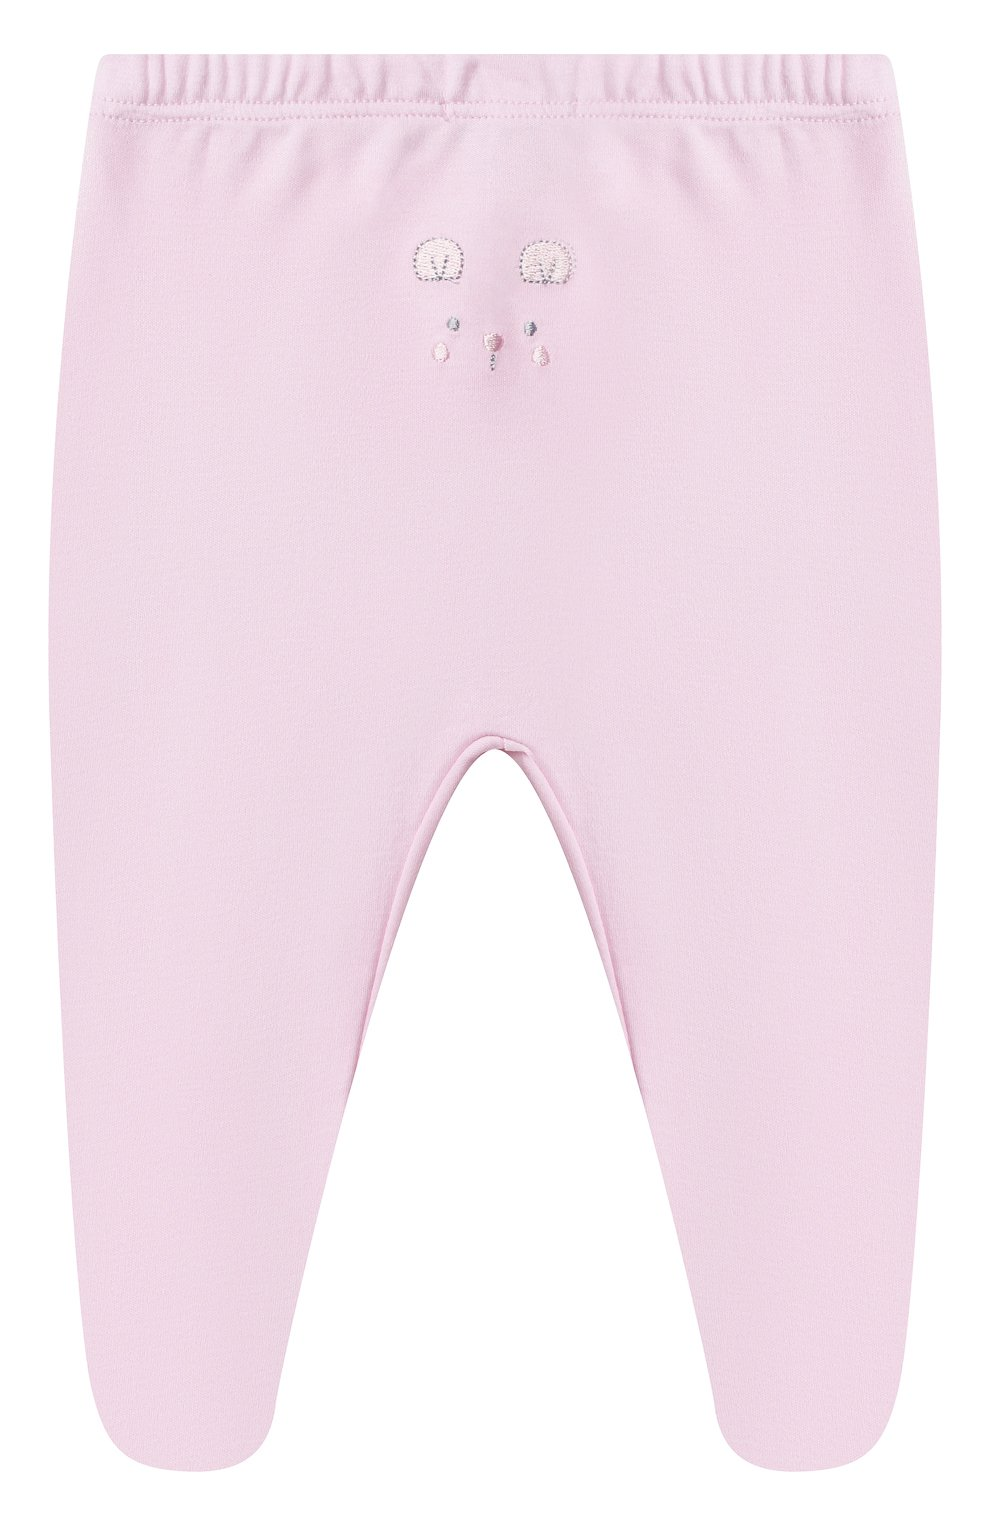 Детские комплект из боди и ползунков KISSY KISSY розового цвета, арт. KGZ05243N | Фото 5